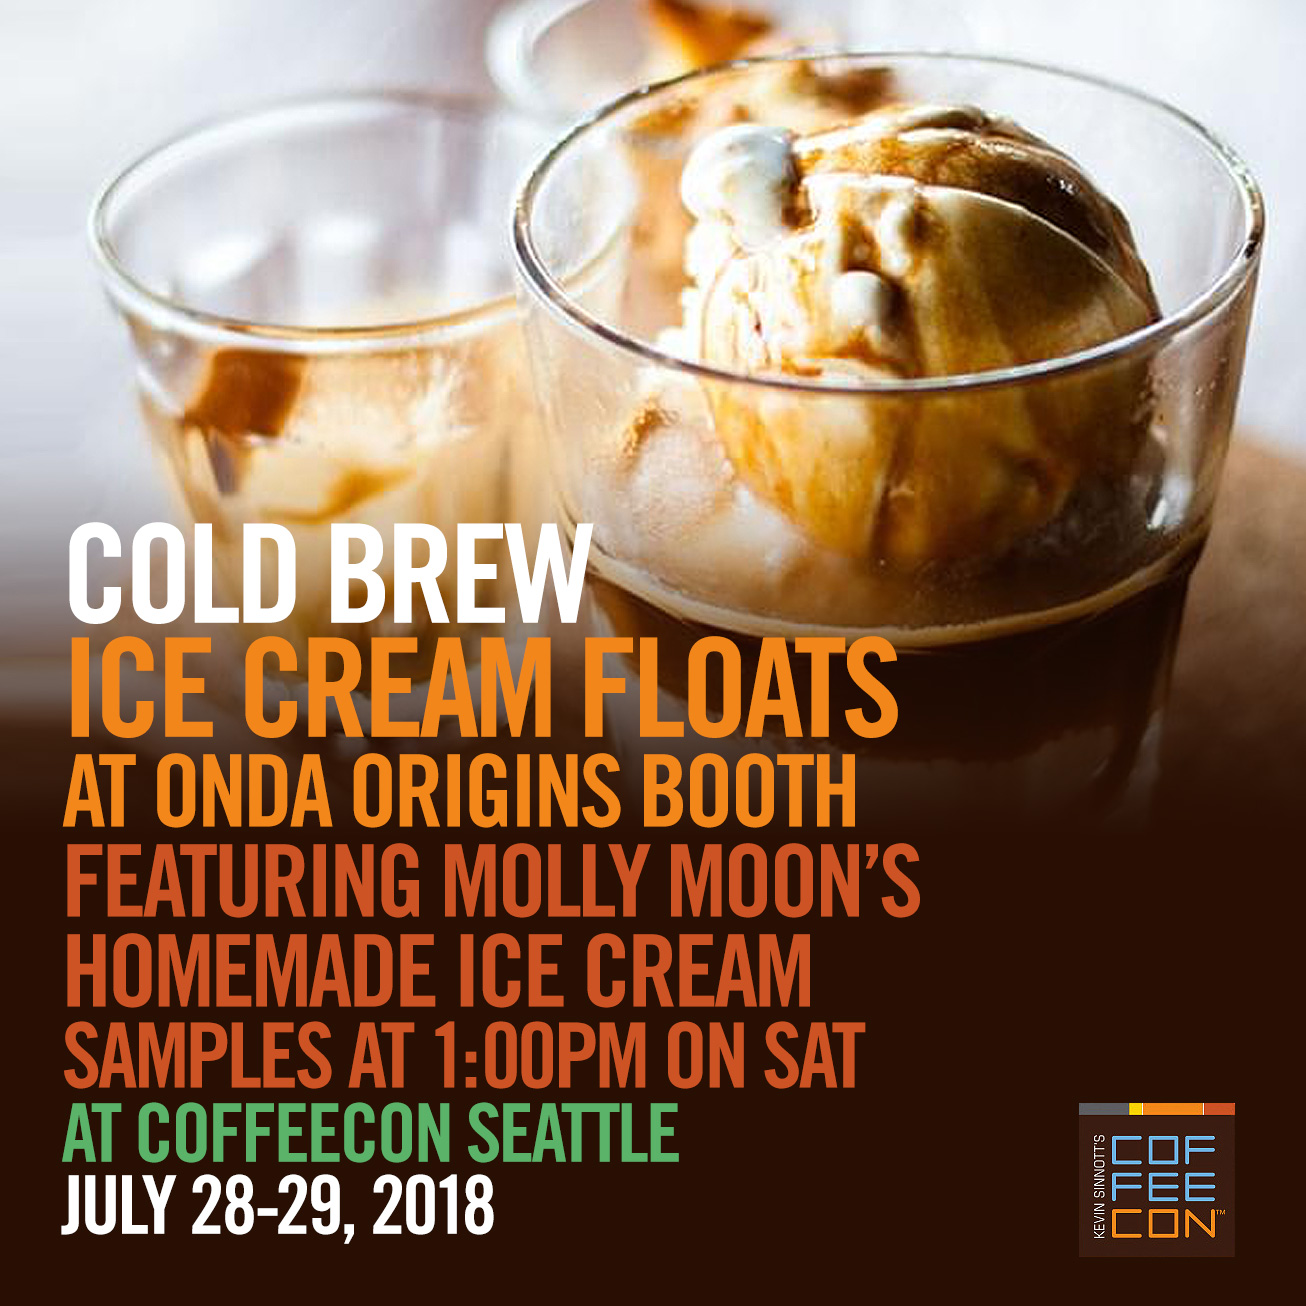 Cold Brew Ice Cream Floats